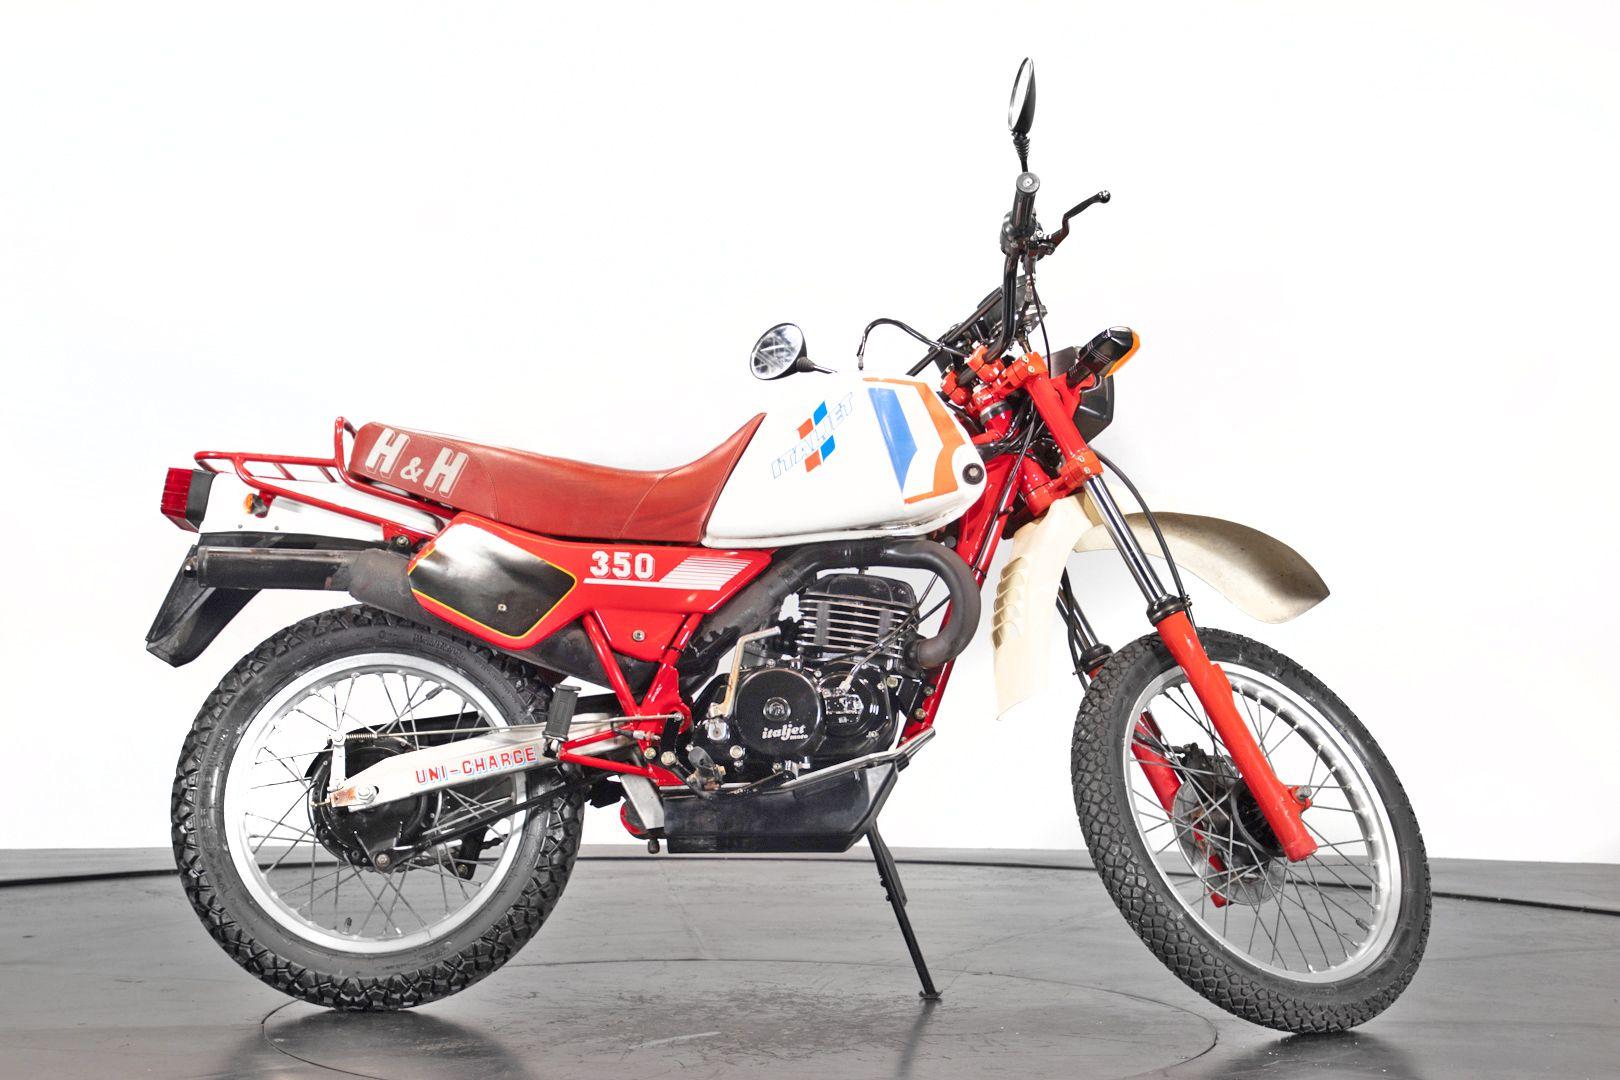 1984 Italjet HH 39412